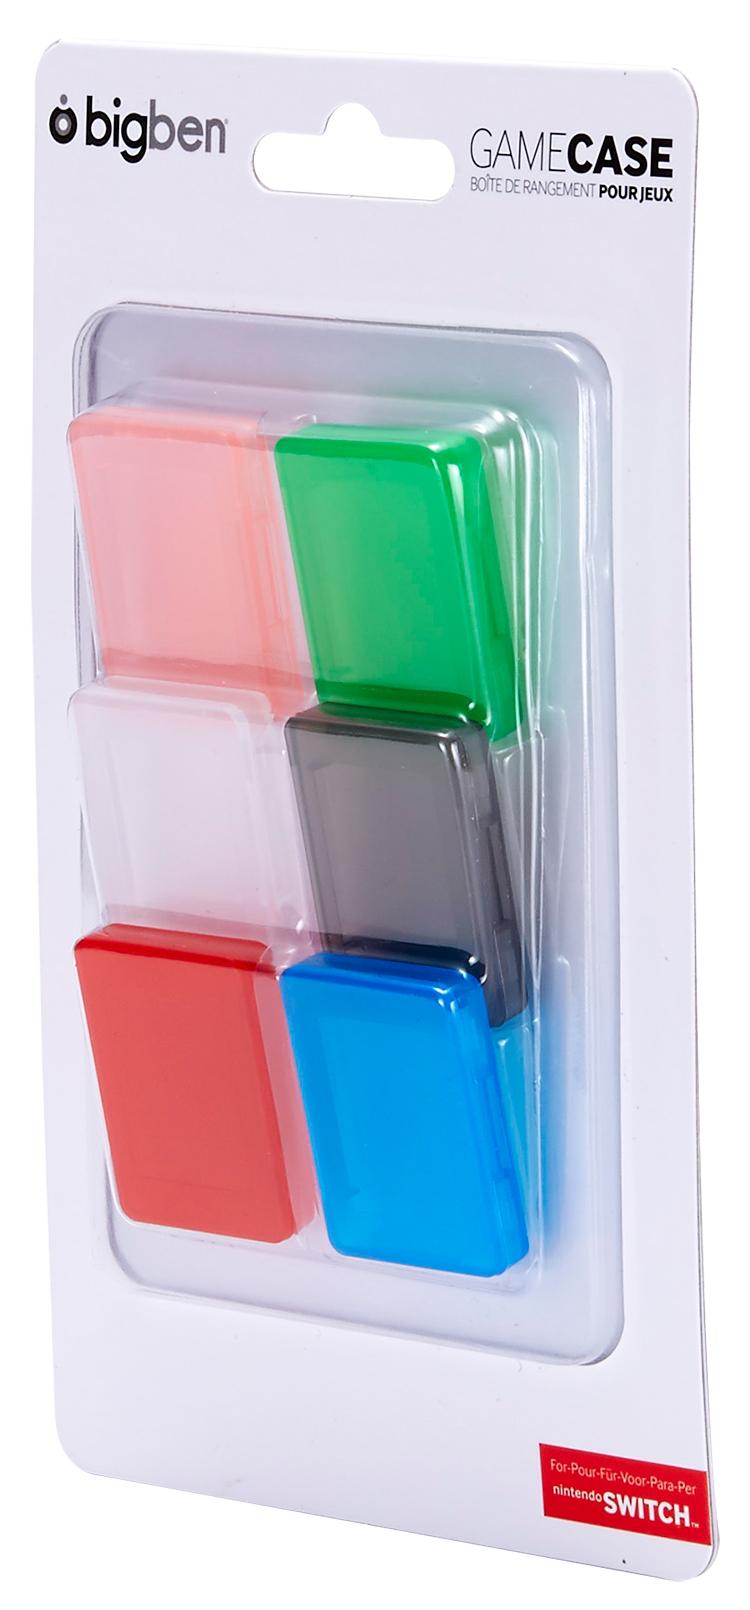 Set of 6 game cartridge cases for Nintendo Switch™ - Image  #2tutu